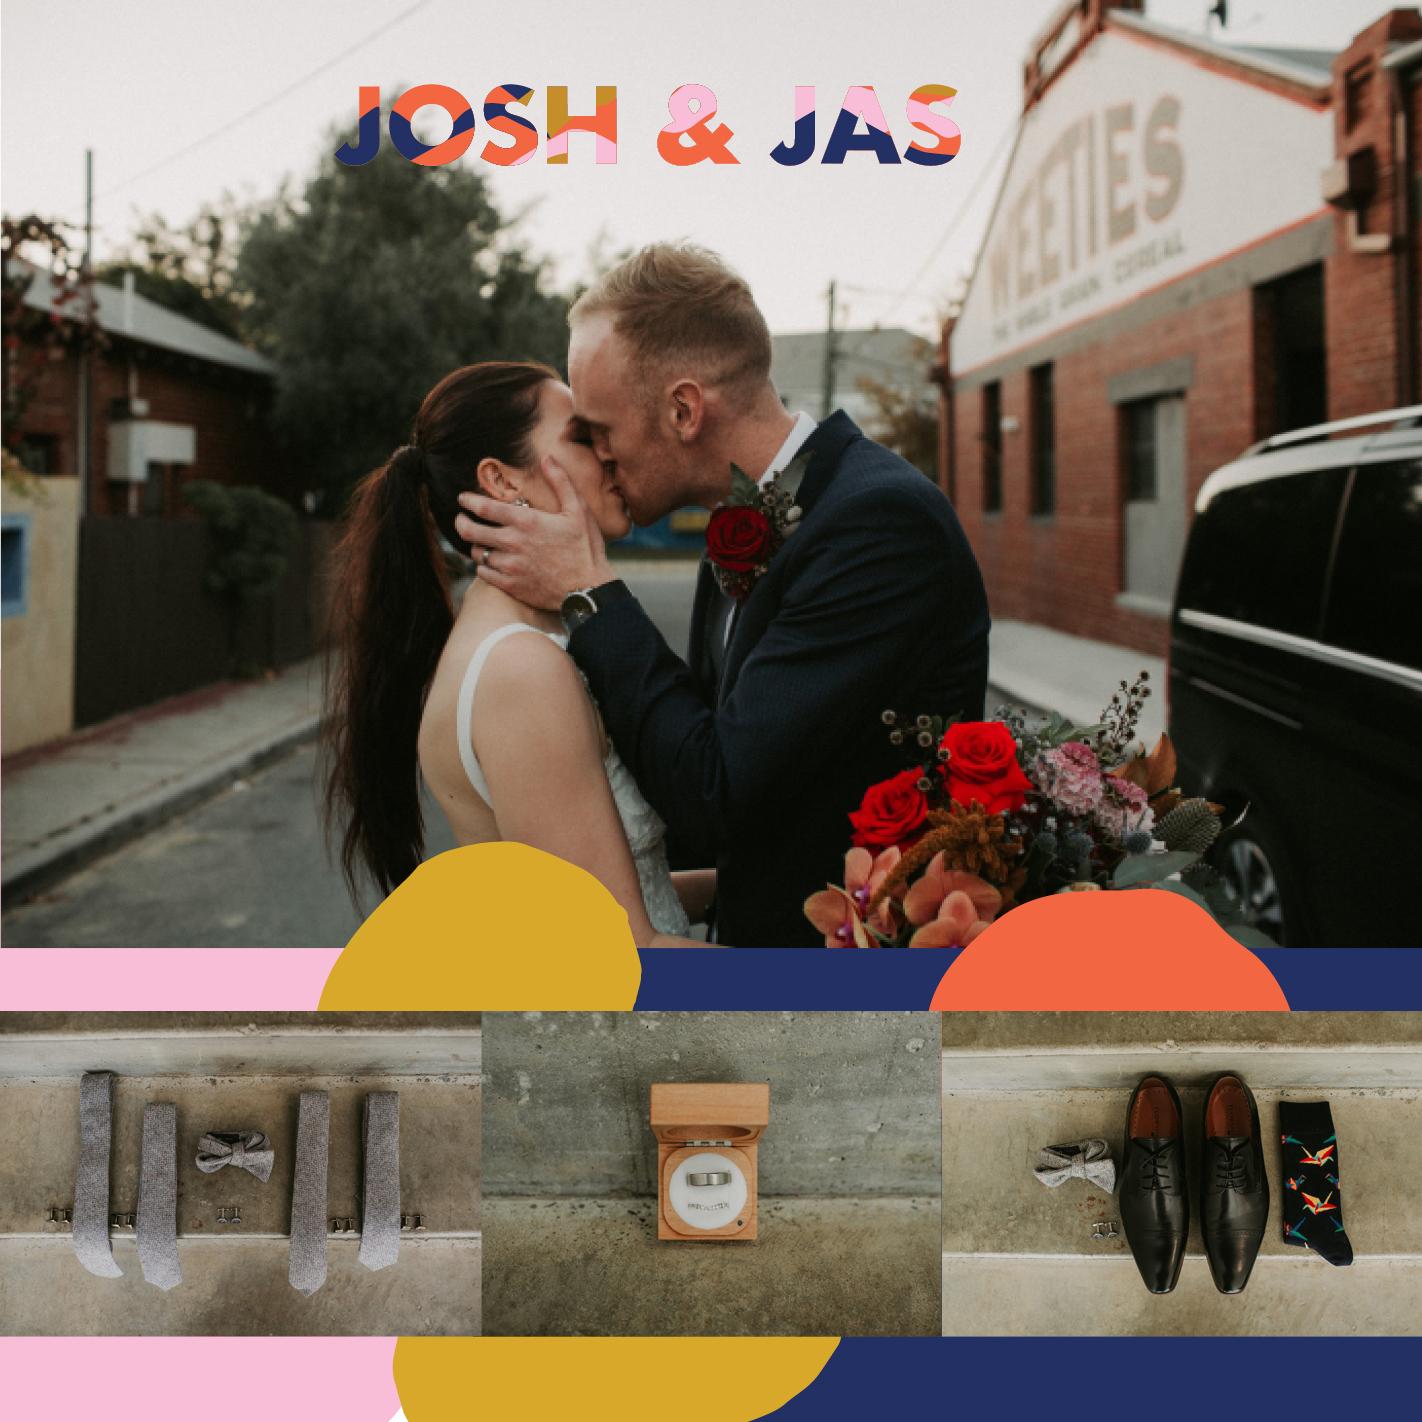 Joash and jas export.jpg